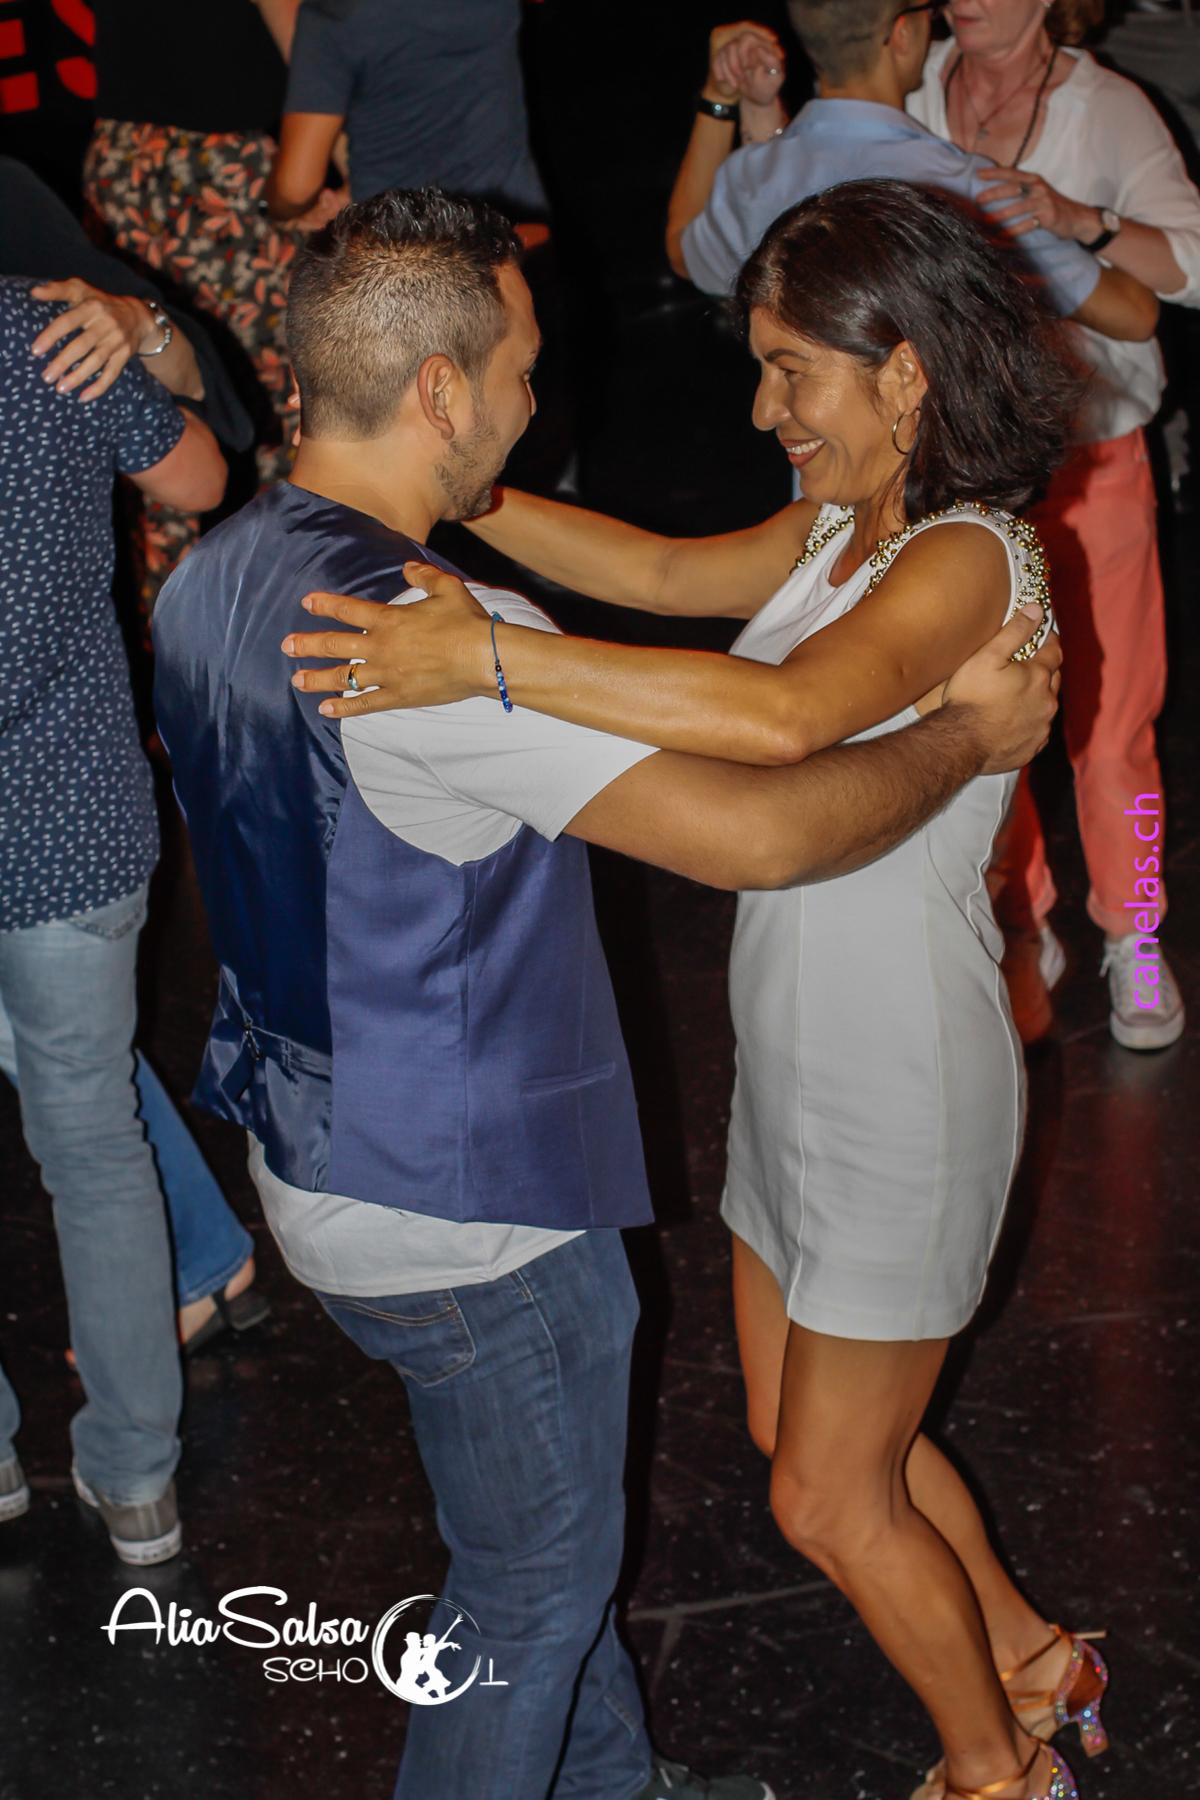 AliaSalsa ecole de danse lausanne soiree bachata salsa cubaineAlia Salsa Soireé Salsa - Bachata